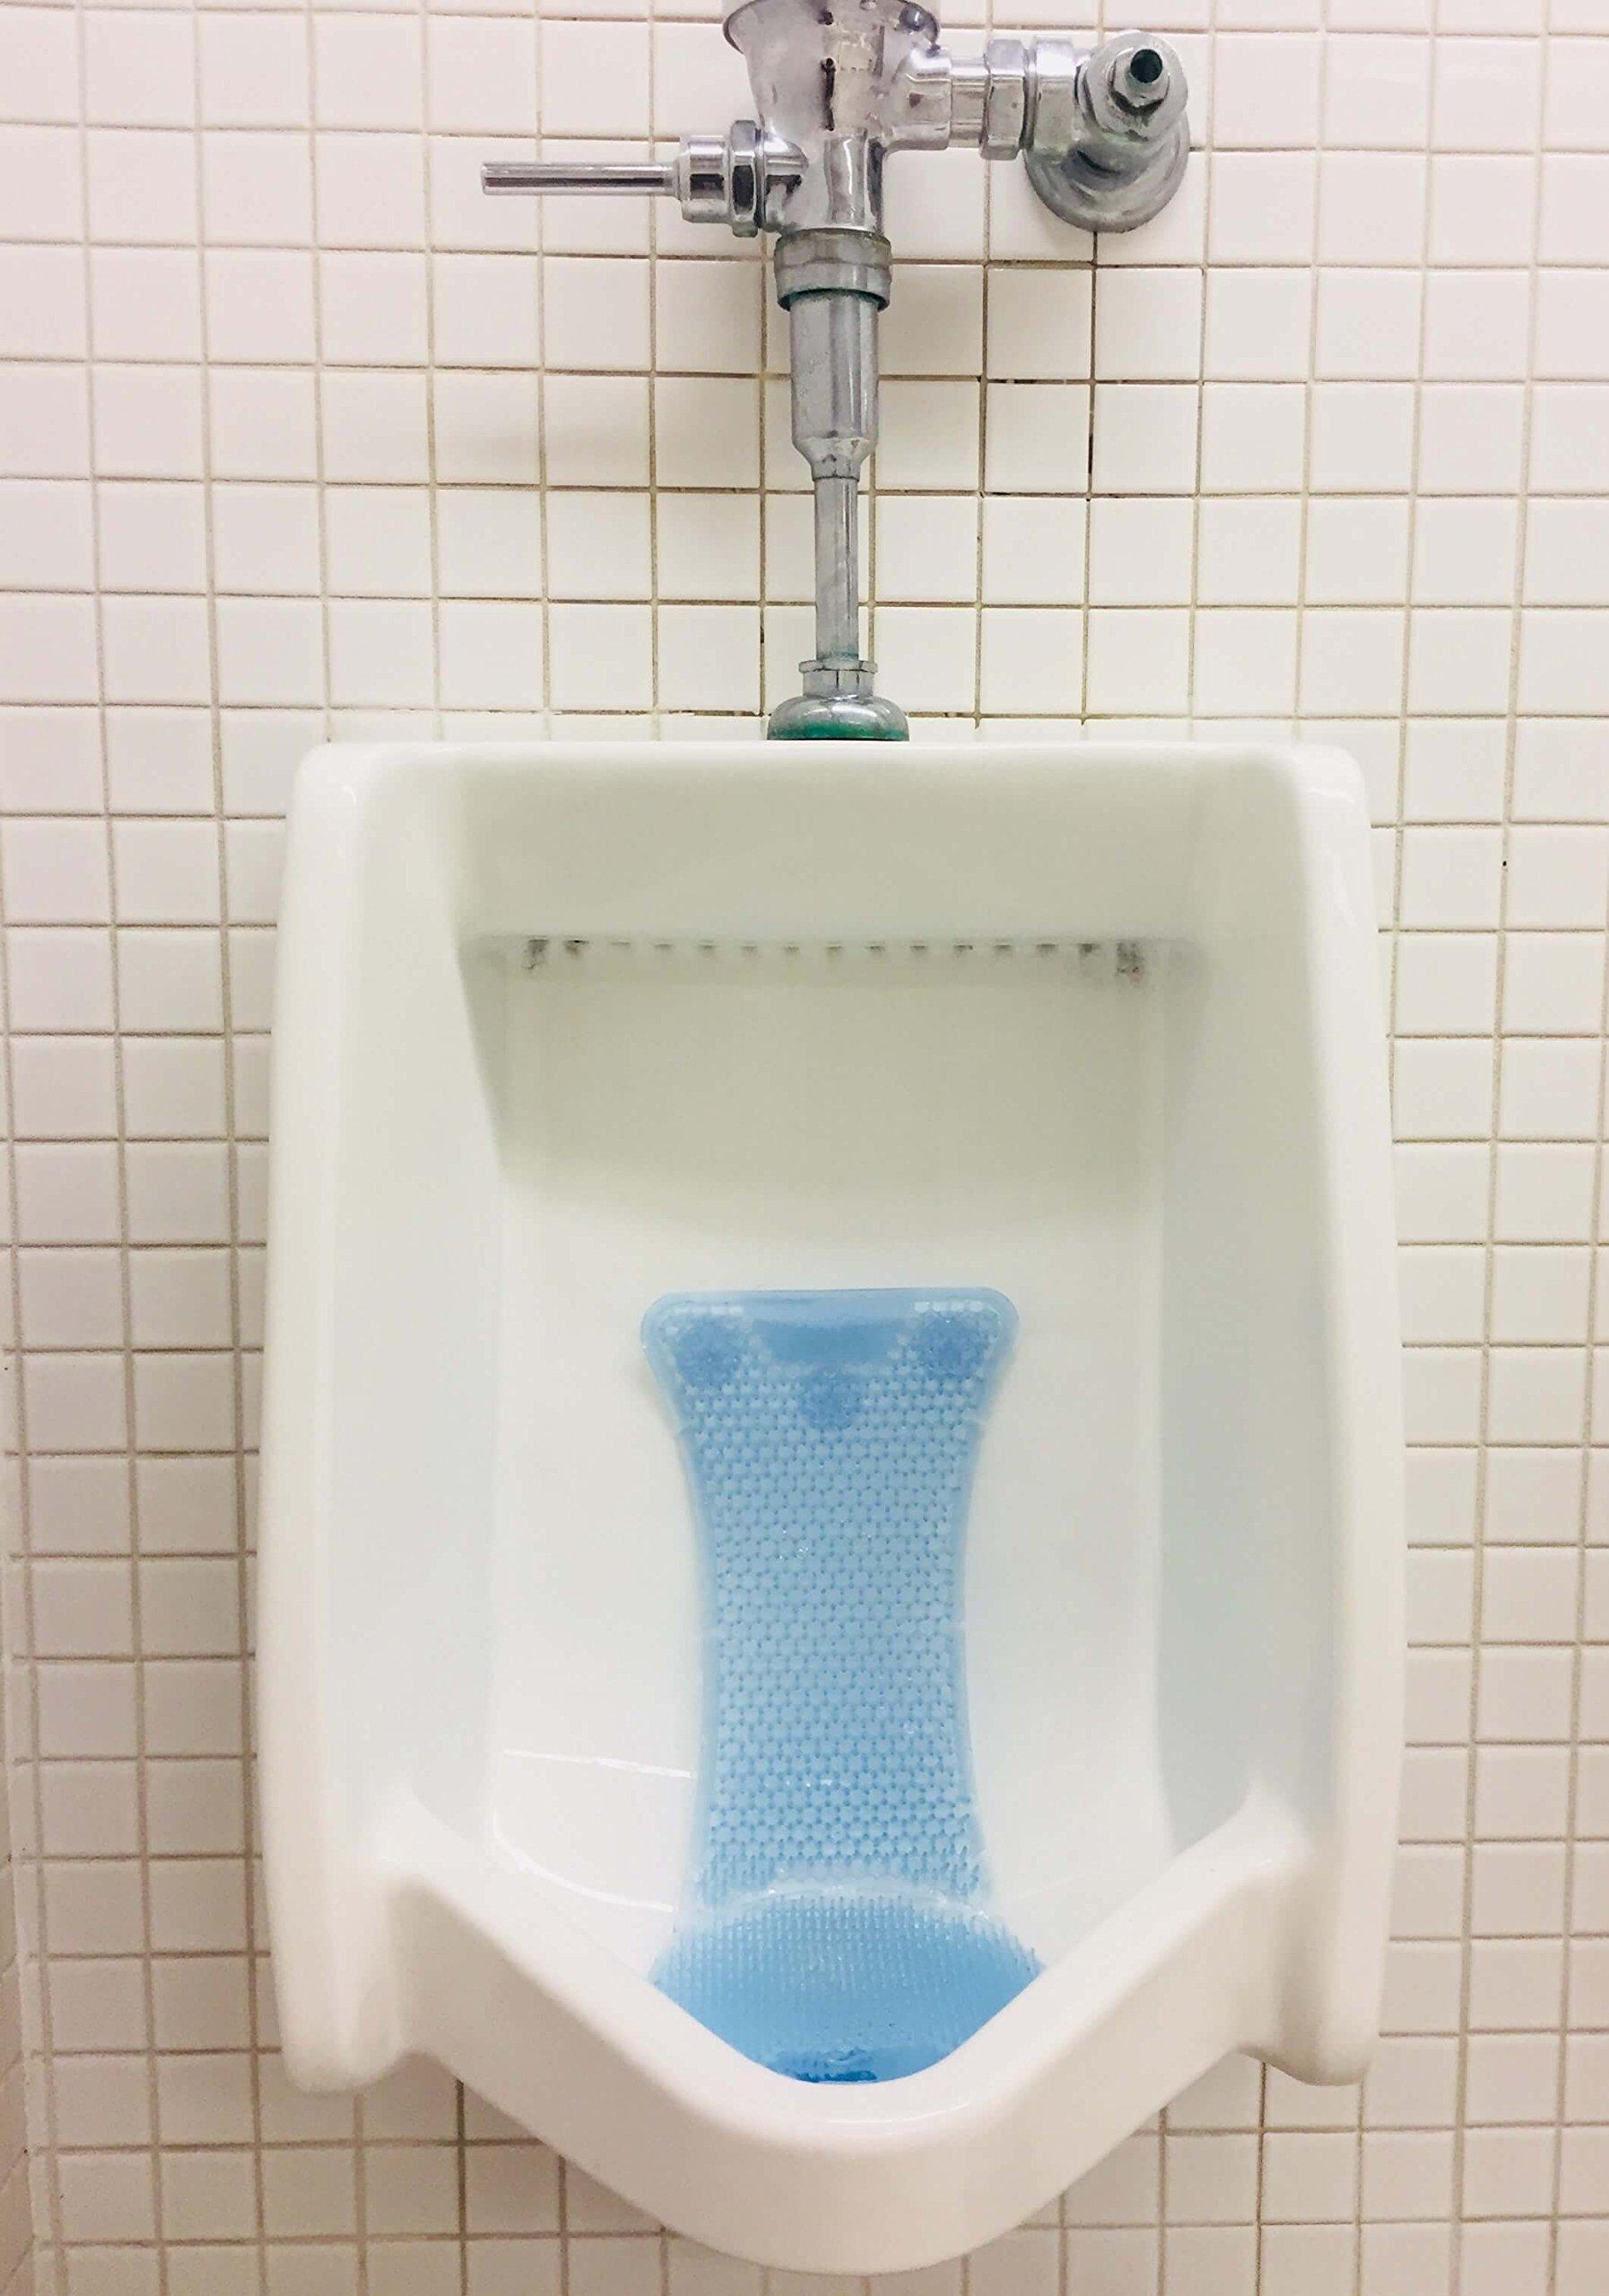 T Market Splash Hog Urinal Screen - Clean Scent   Reduces Splash-Back   Long Lasting Fragrance   Deodorizes for up to 60 Days   6-Pack, Light Blue by T Market (Image #4)